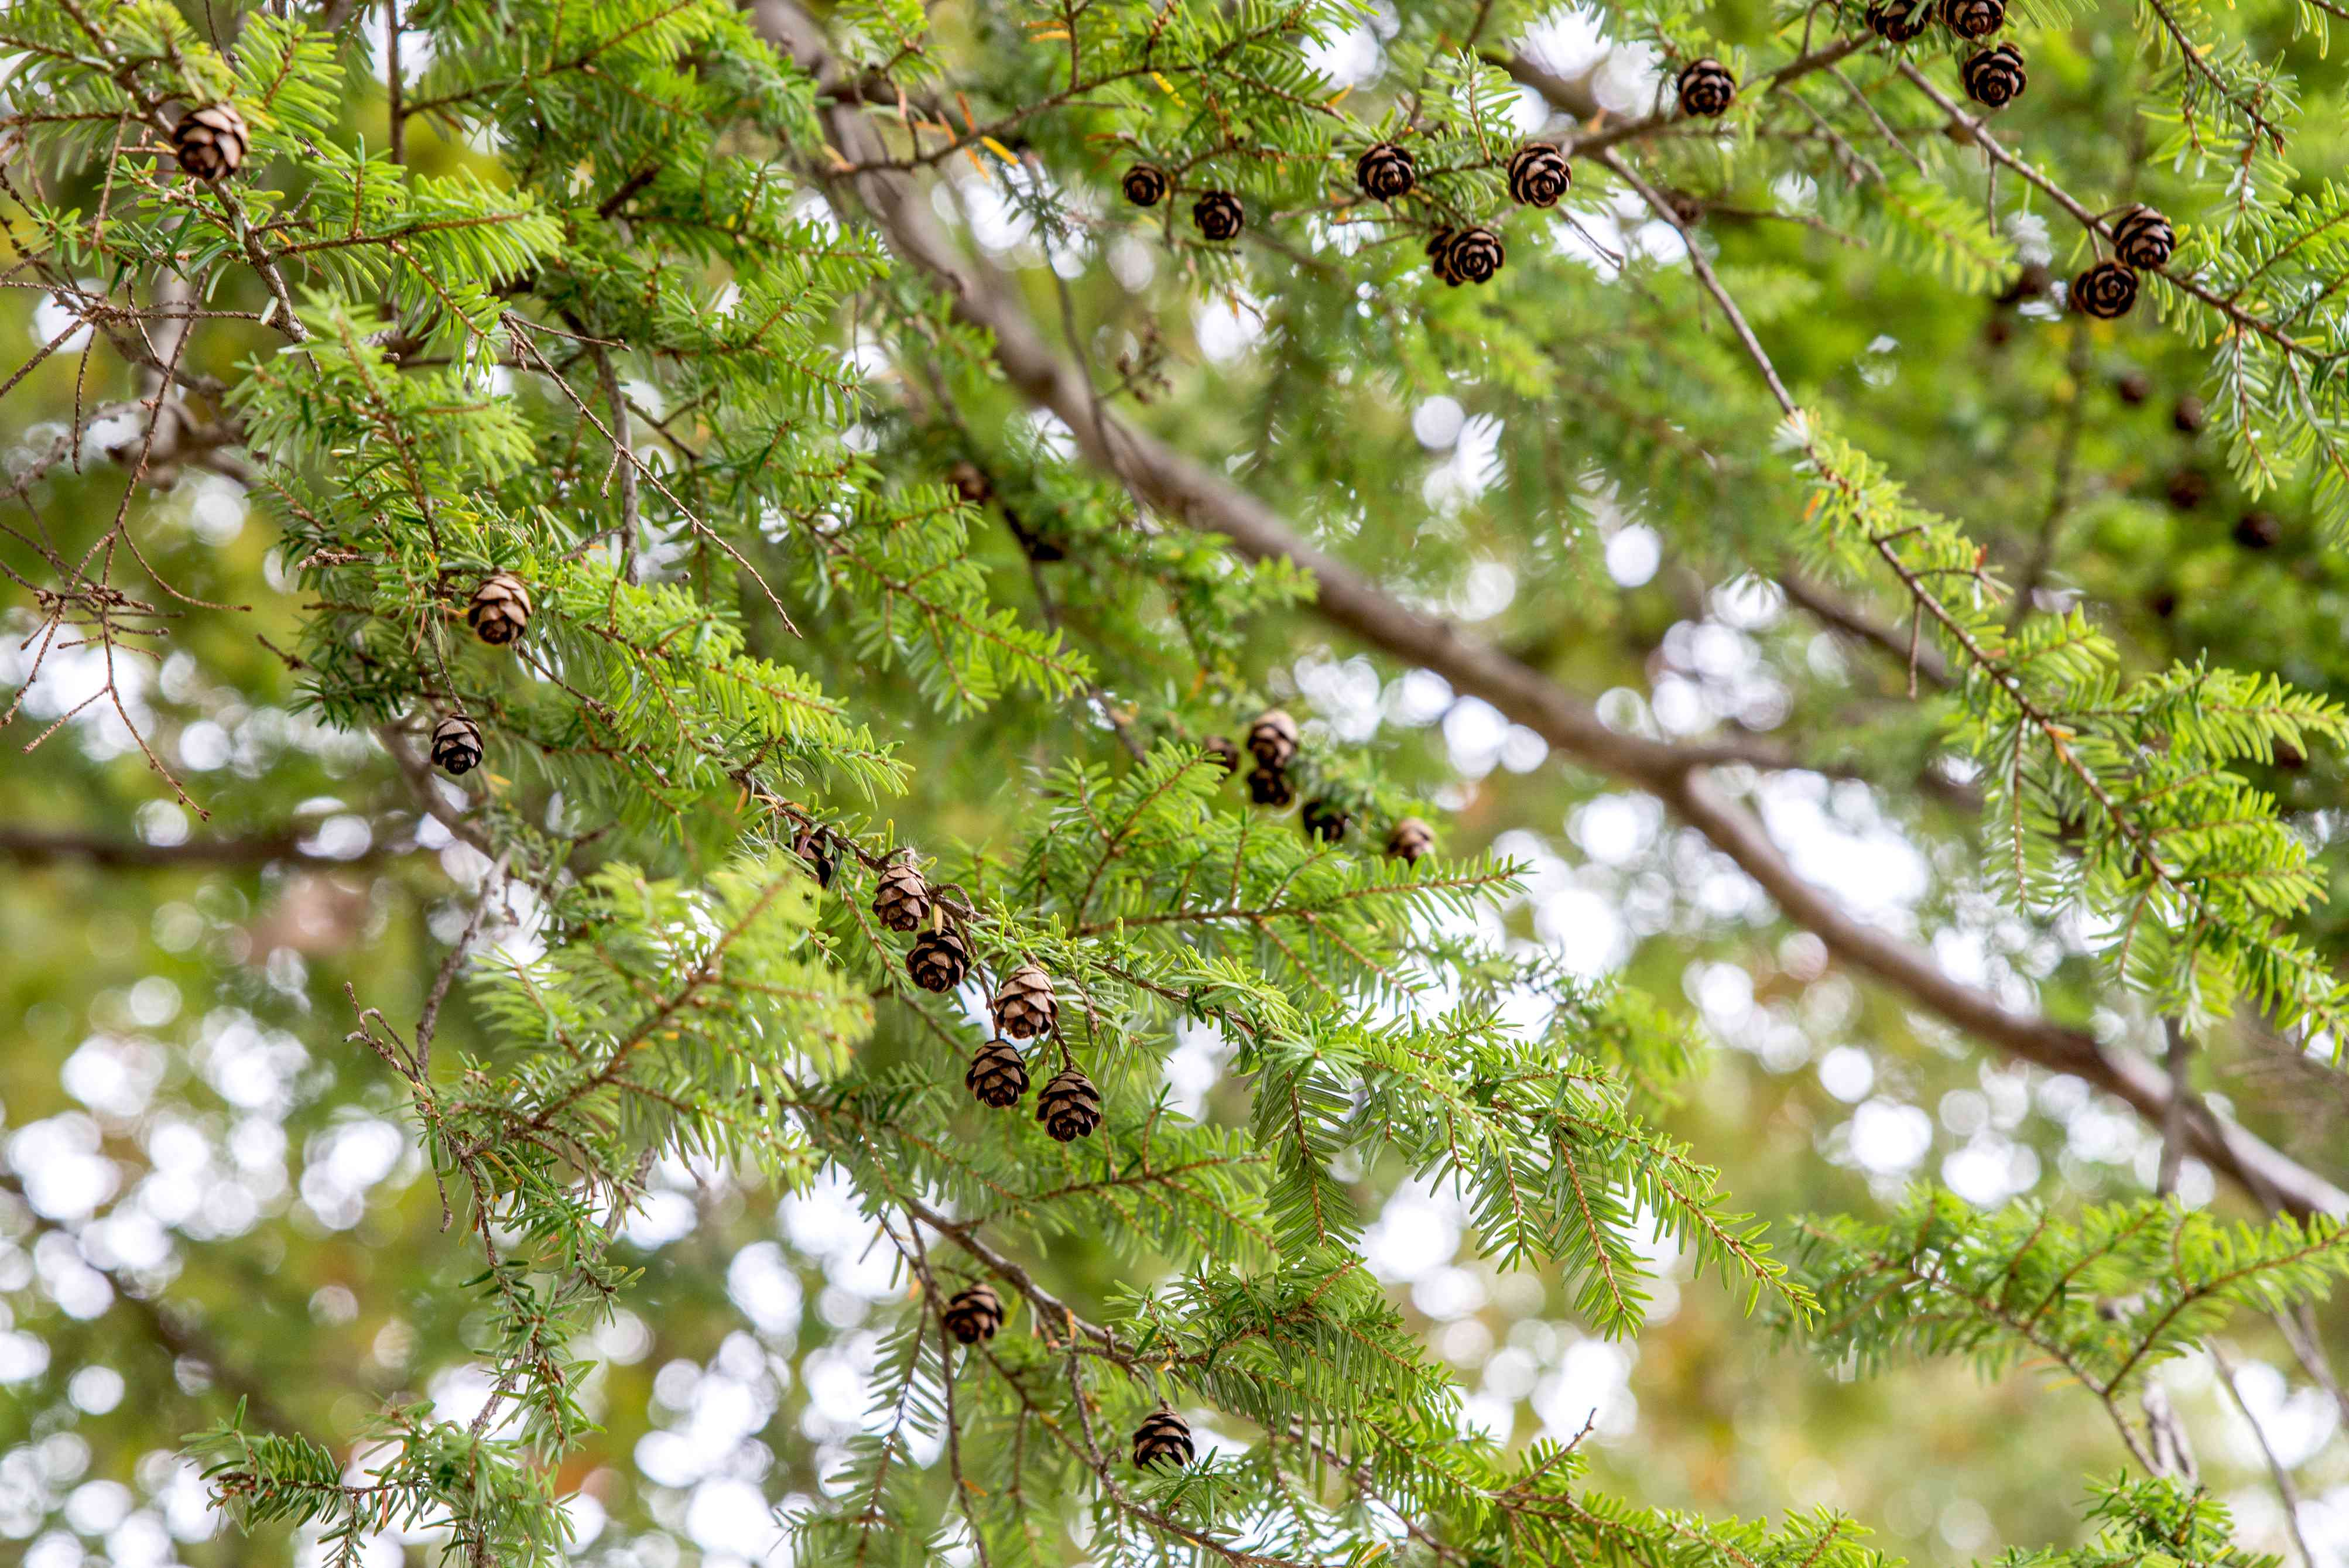 Canadian hemlock bearing cones